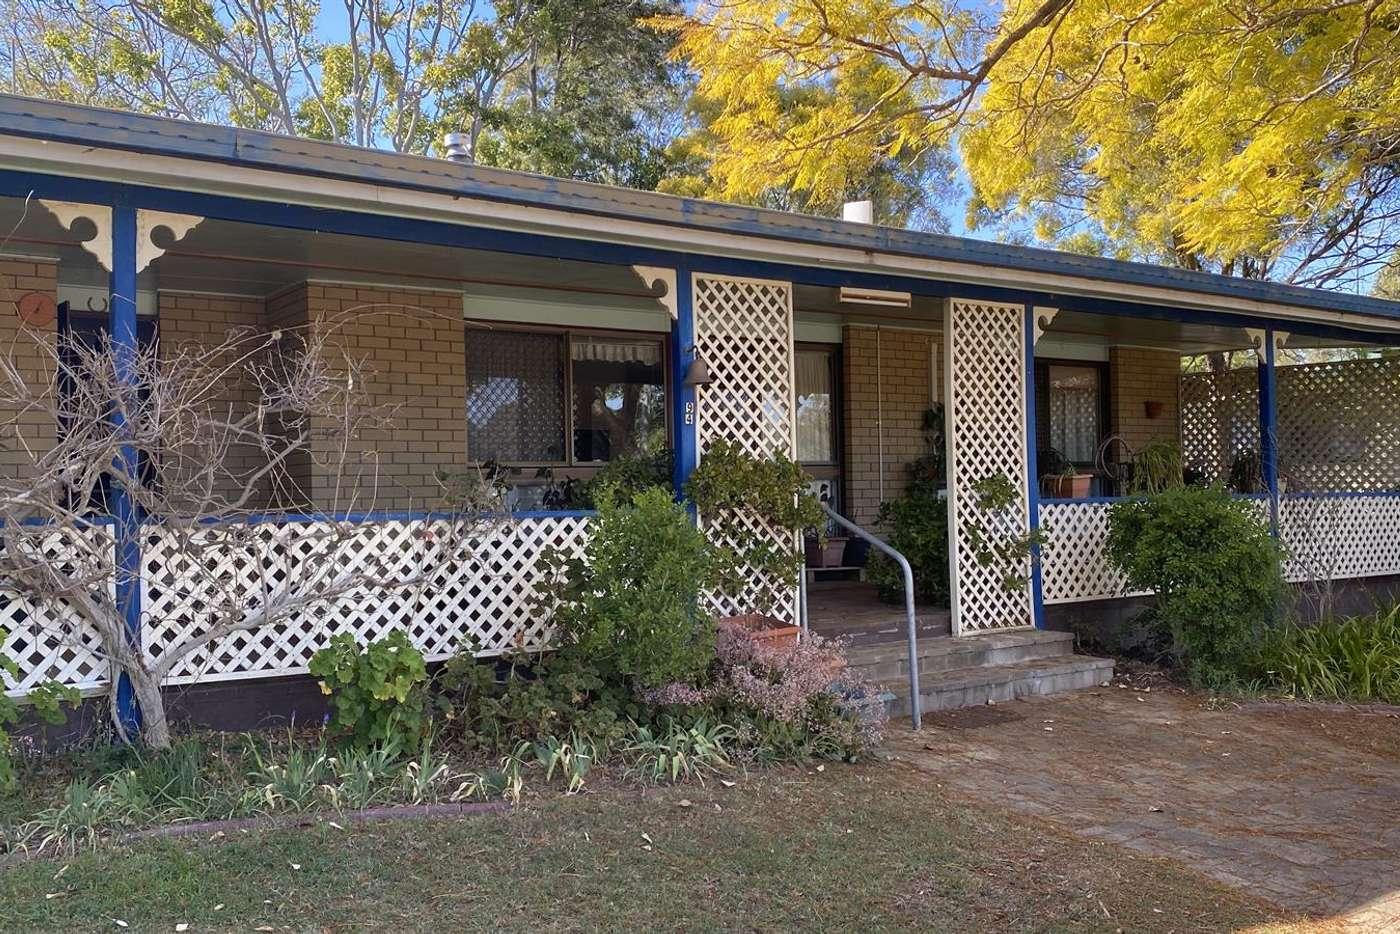 Main view of Homely house listing, 94 Burnett St, Nanango QLD 4615